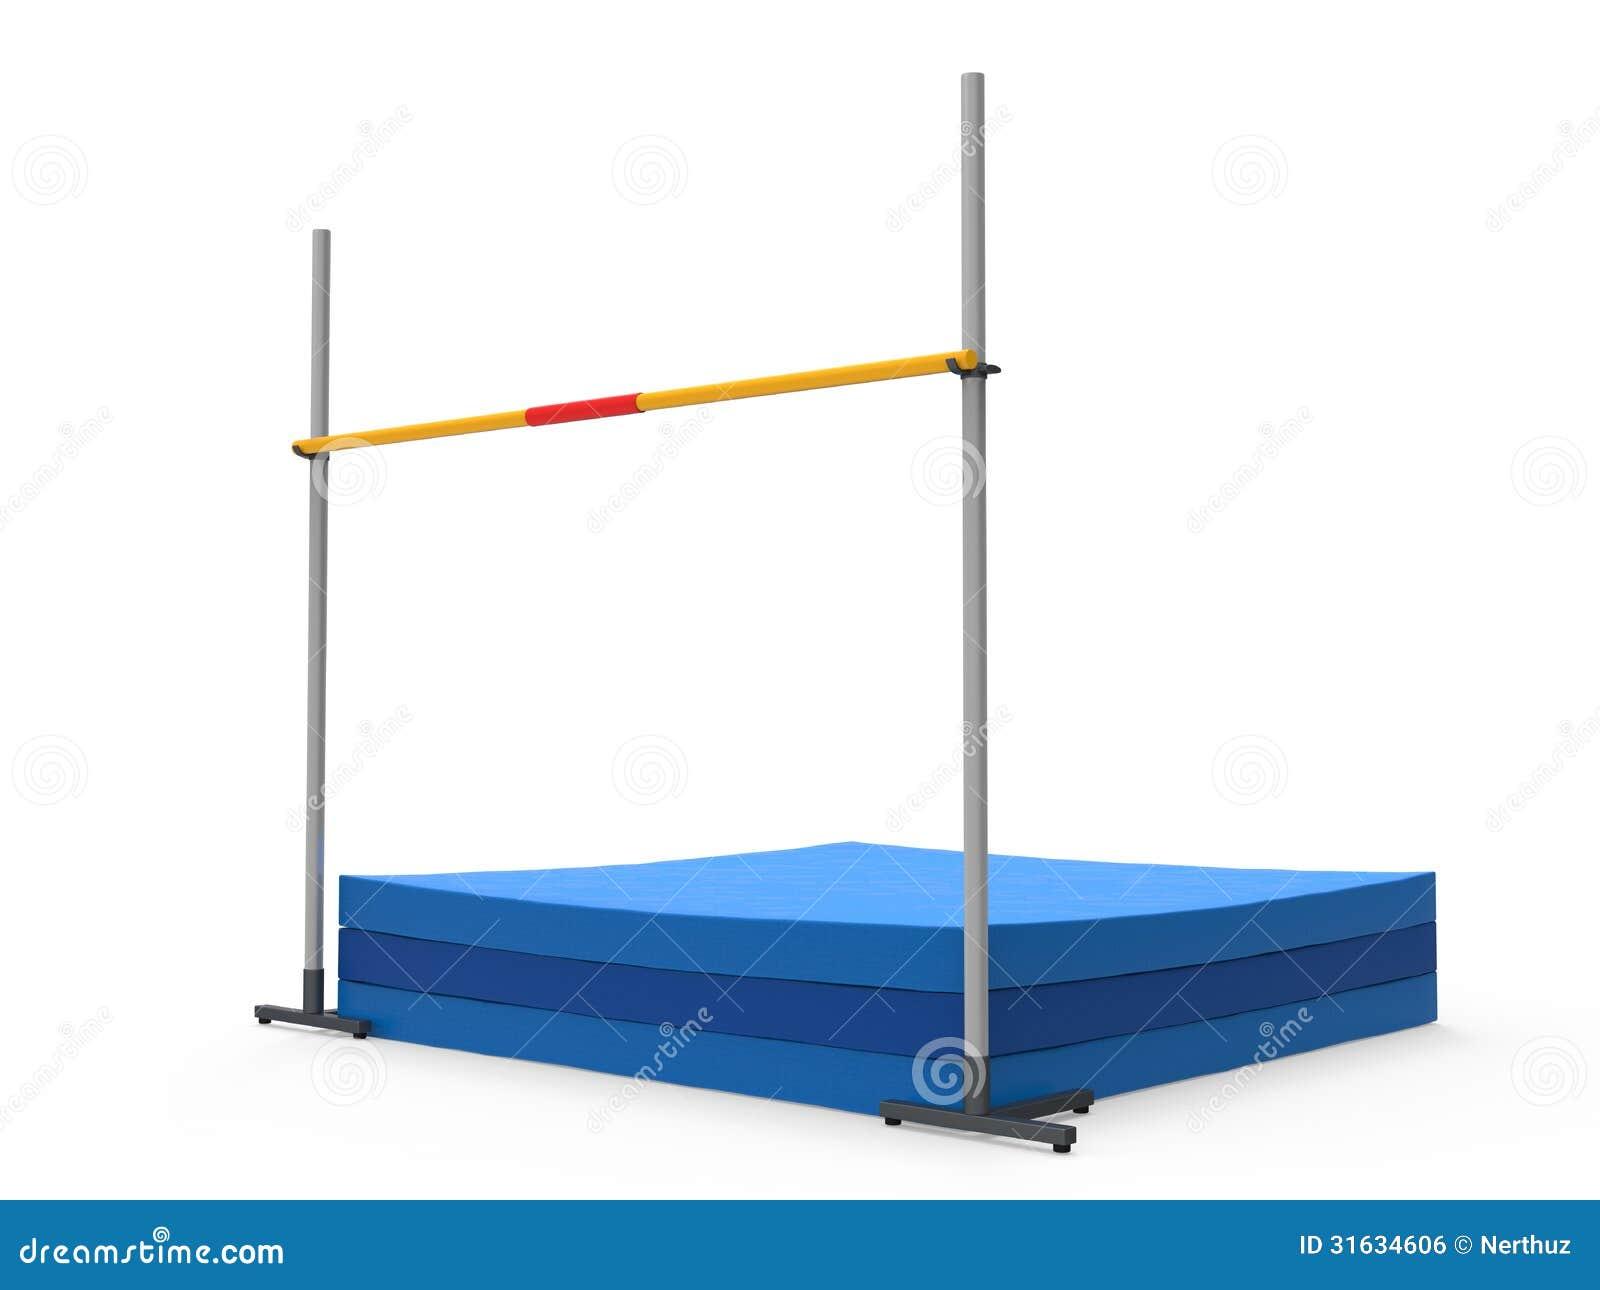 certification buy jump detail on mats mat product area high landing equipment iaaf